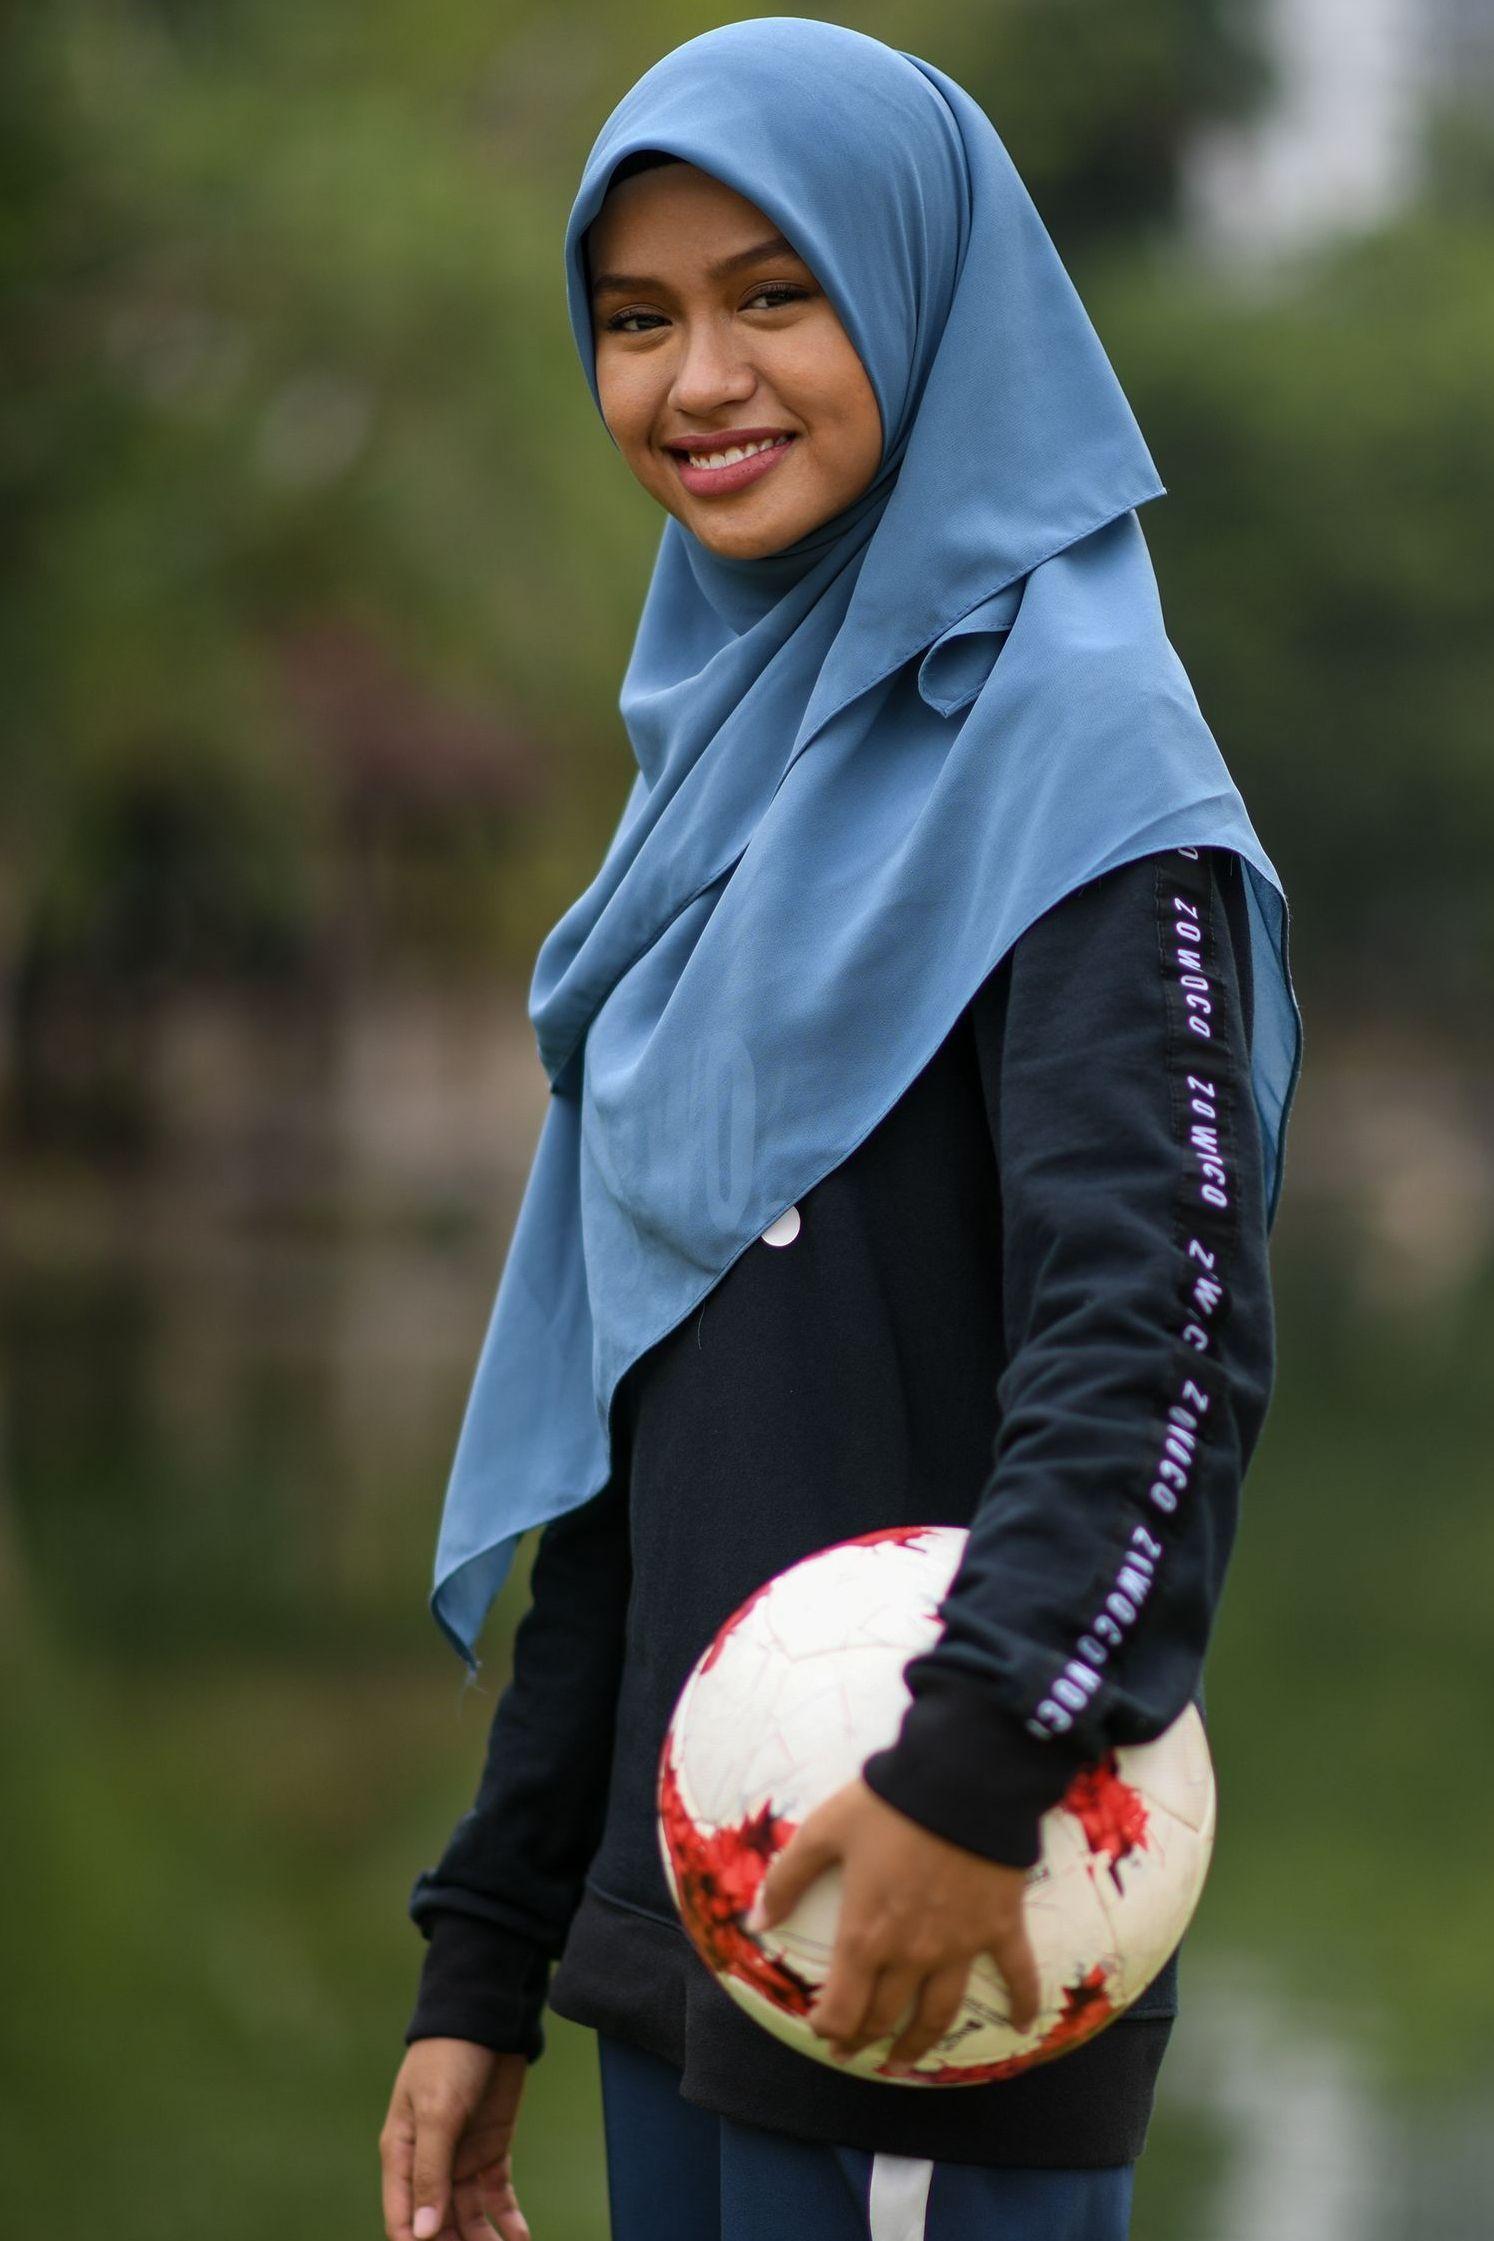 Of hijab pics girls wearing Young girls